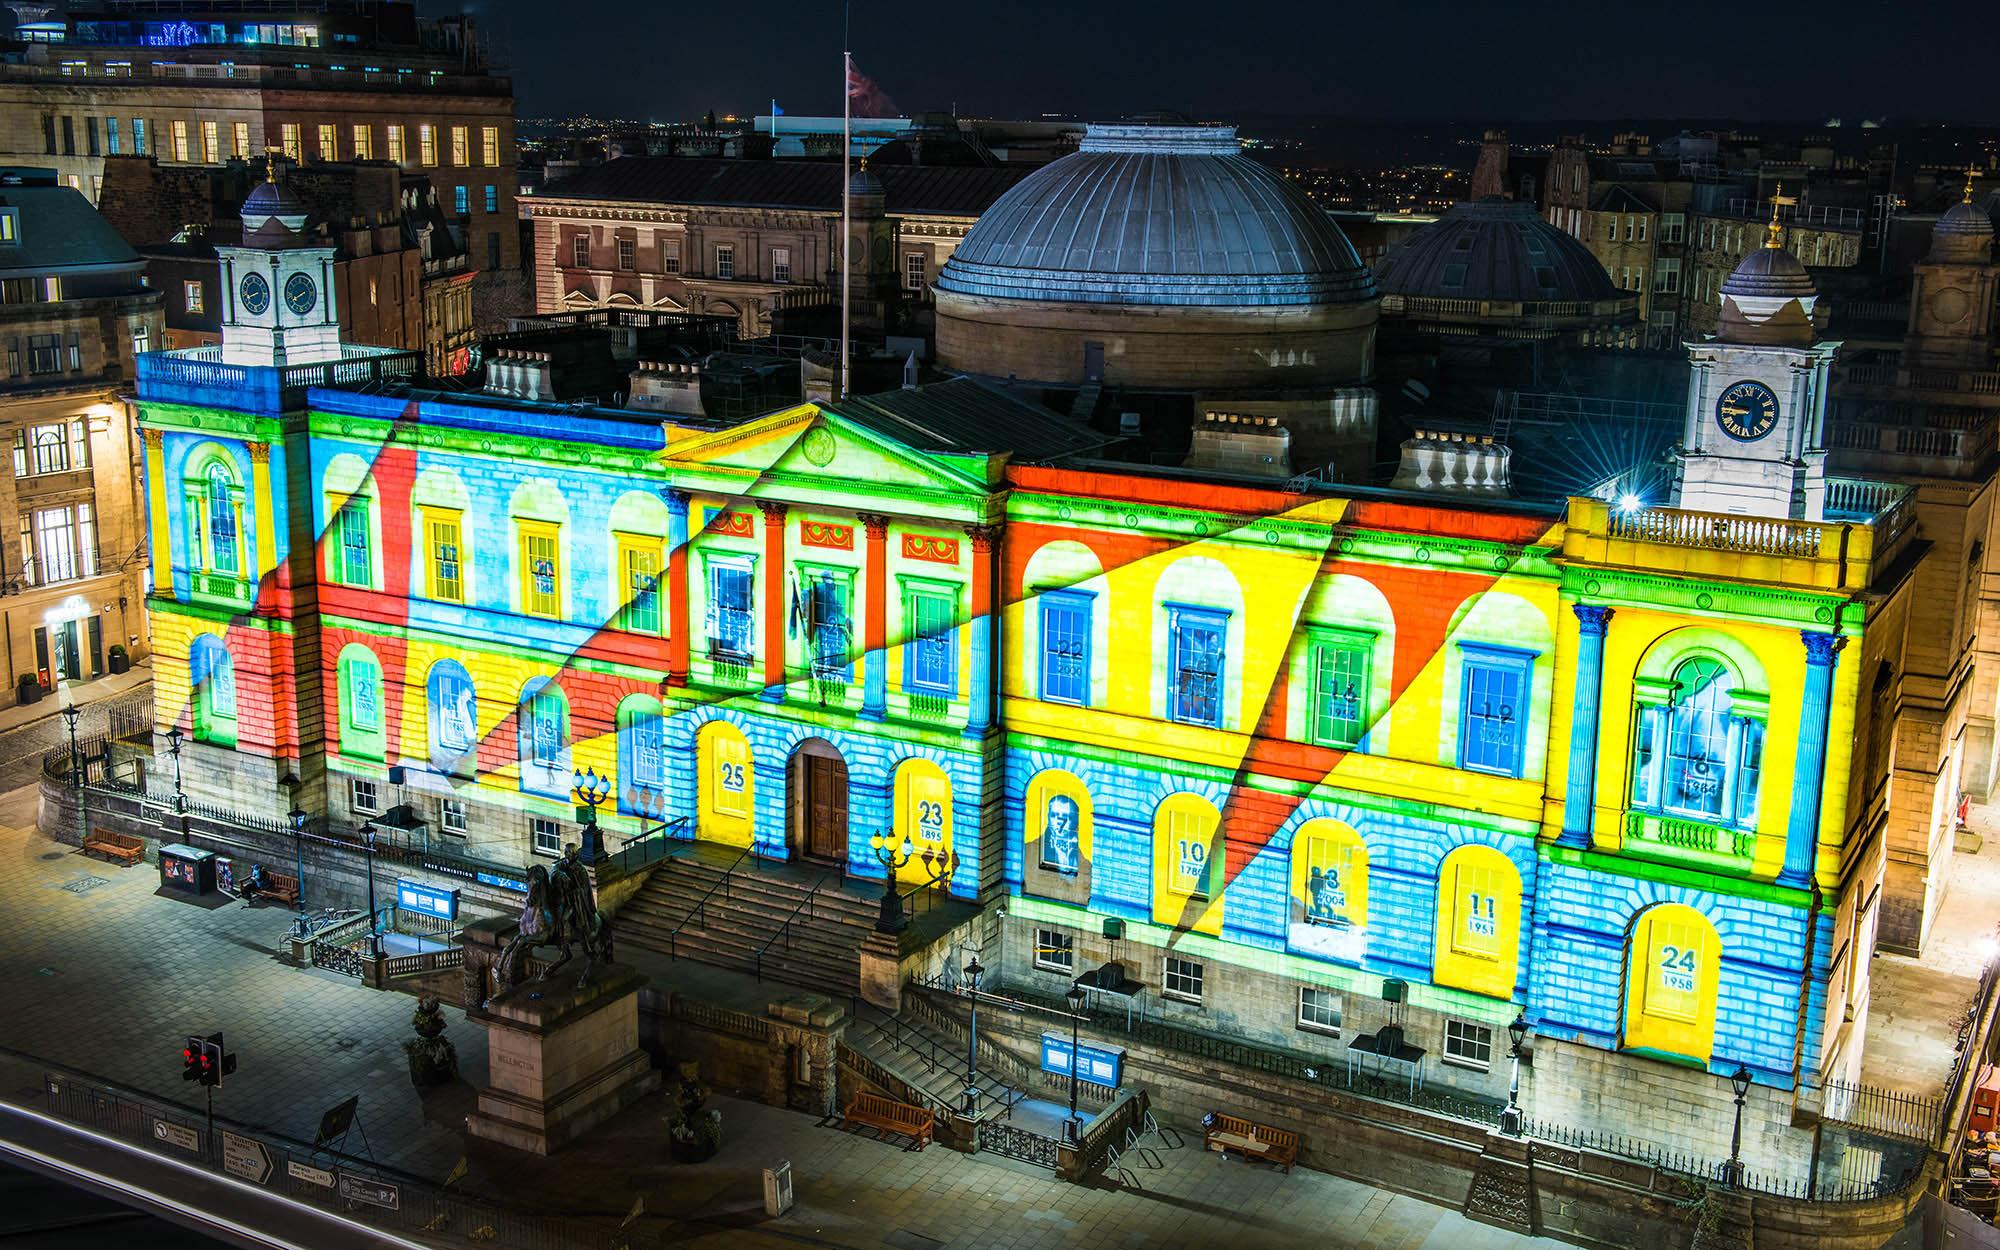 Edinburgh's Giant Advent Calendar Christmas projections on Register House